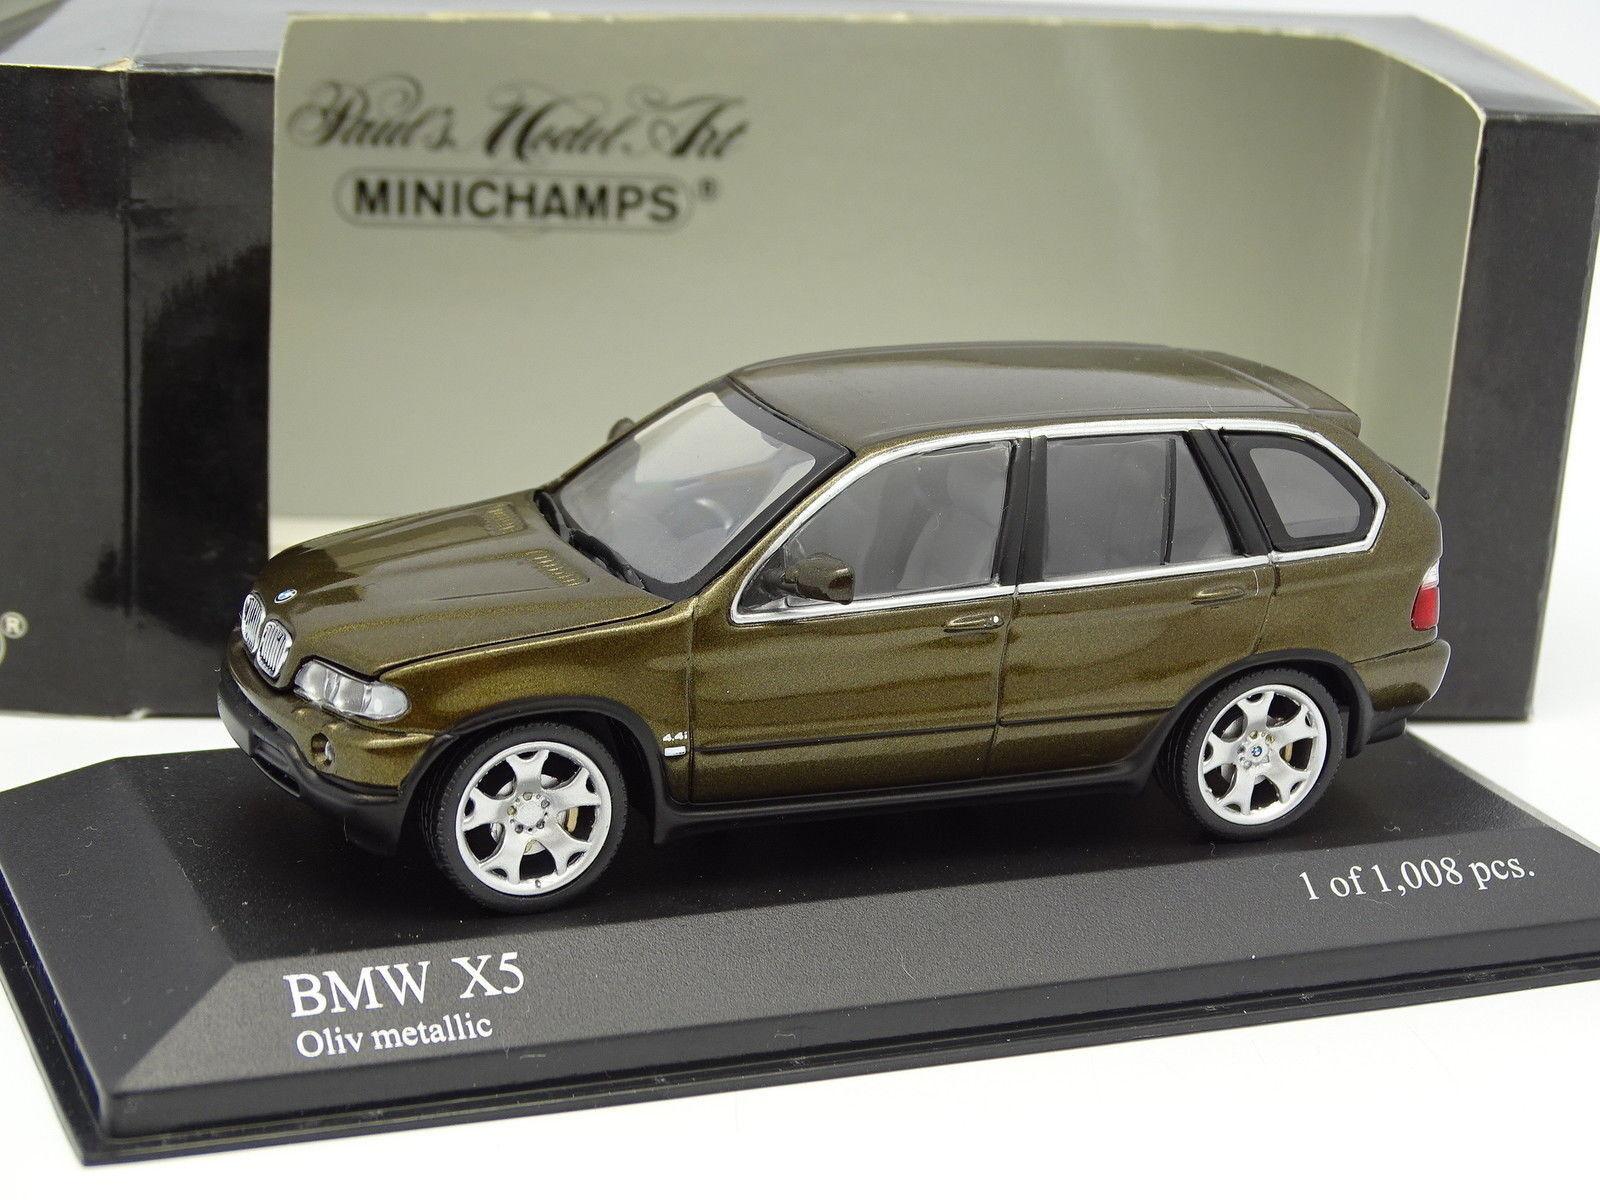 Minichamps 1 43 - BMW X5 4.4I 2000 green green oliva